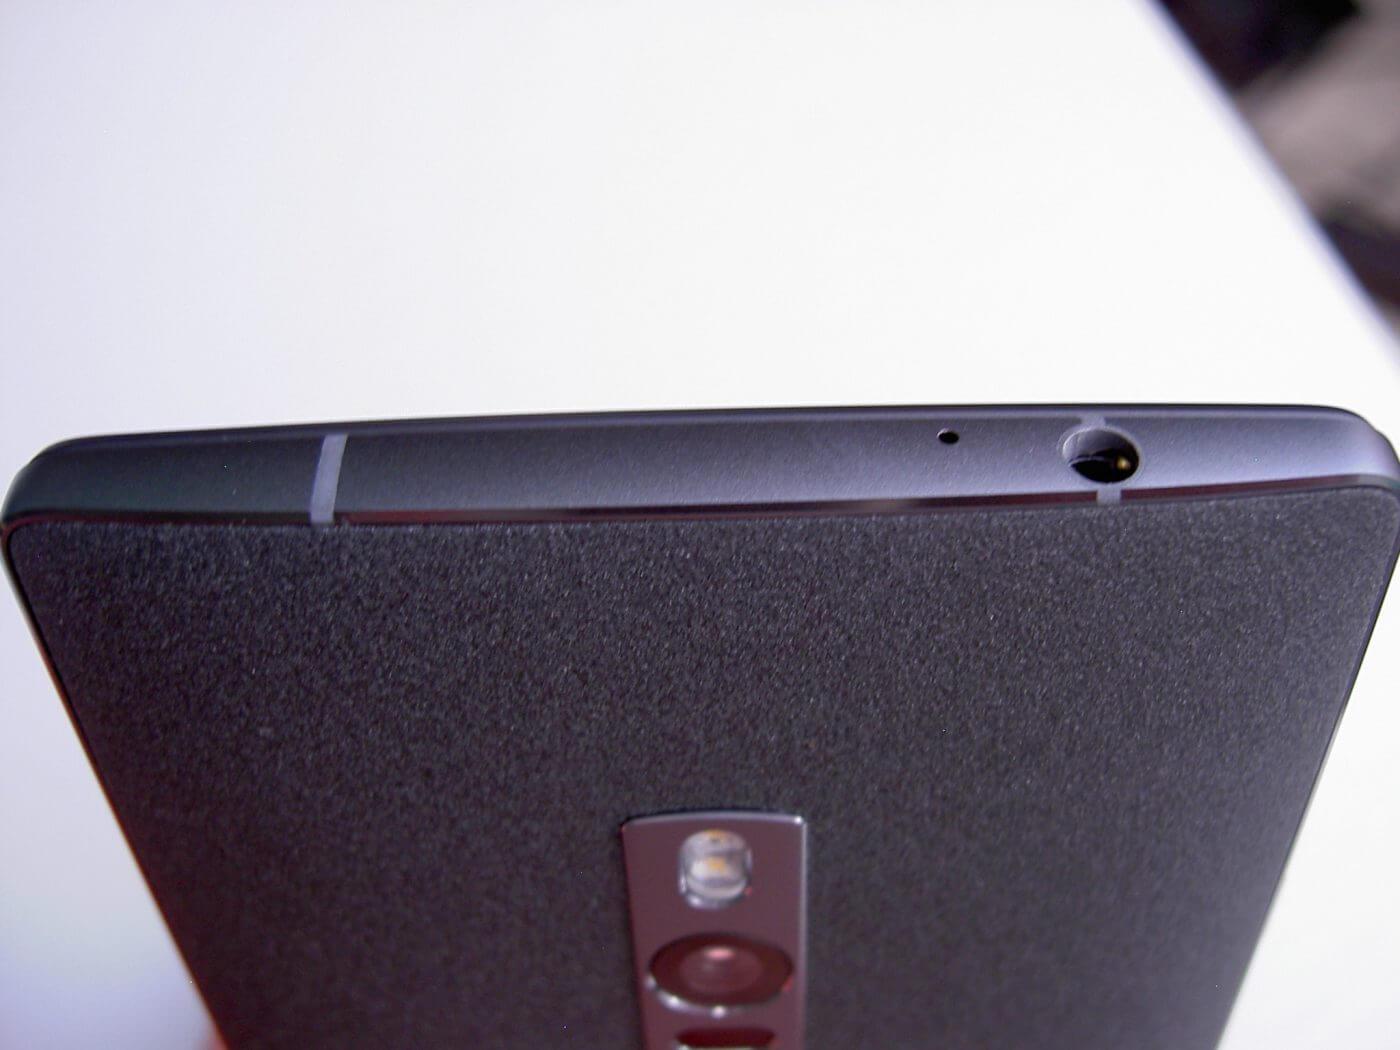 OnePlus 2 Top